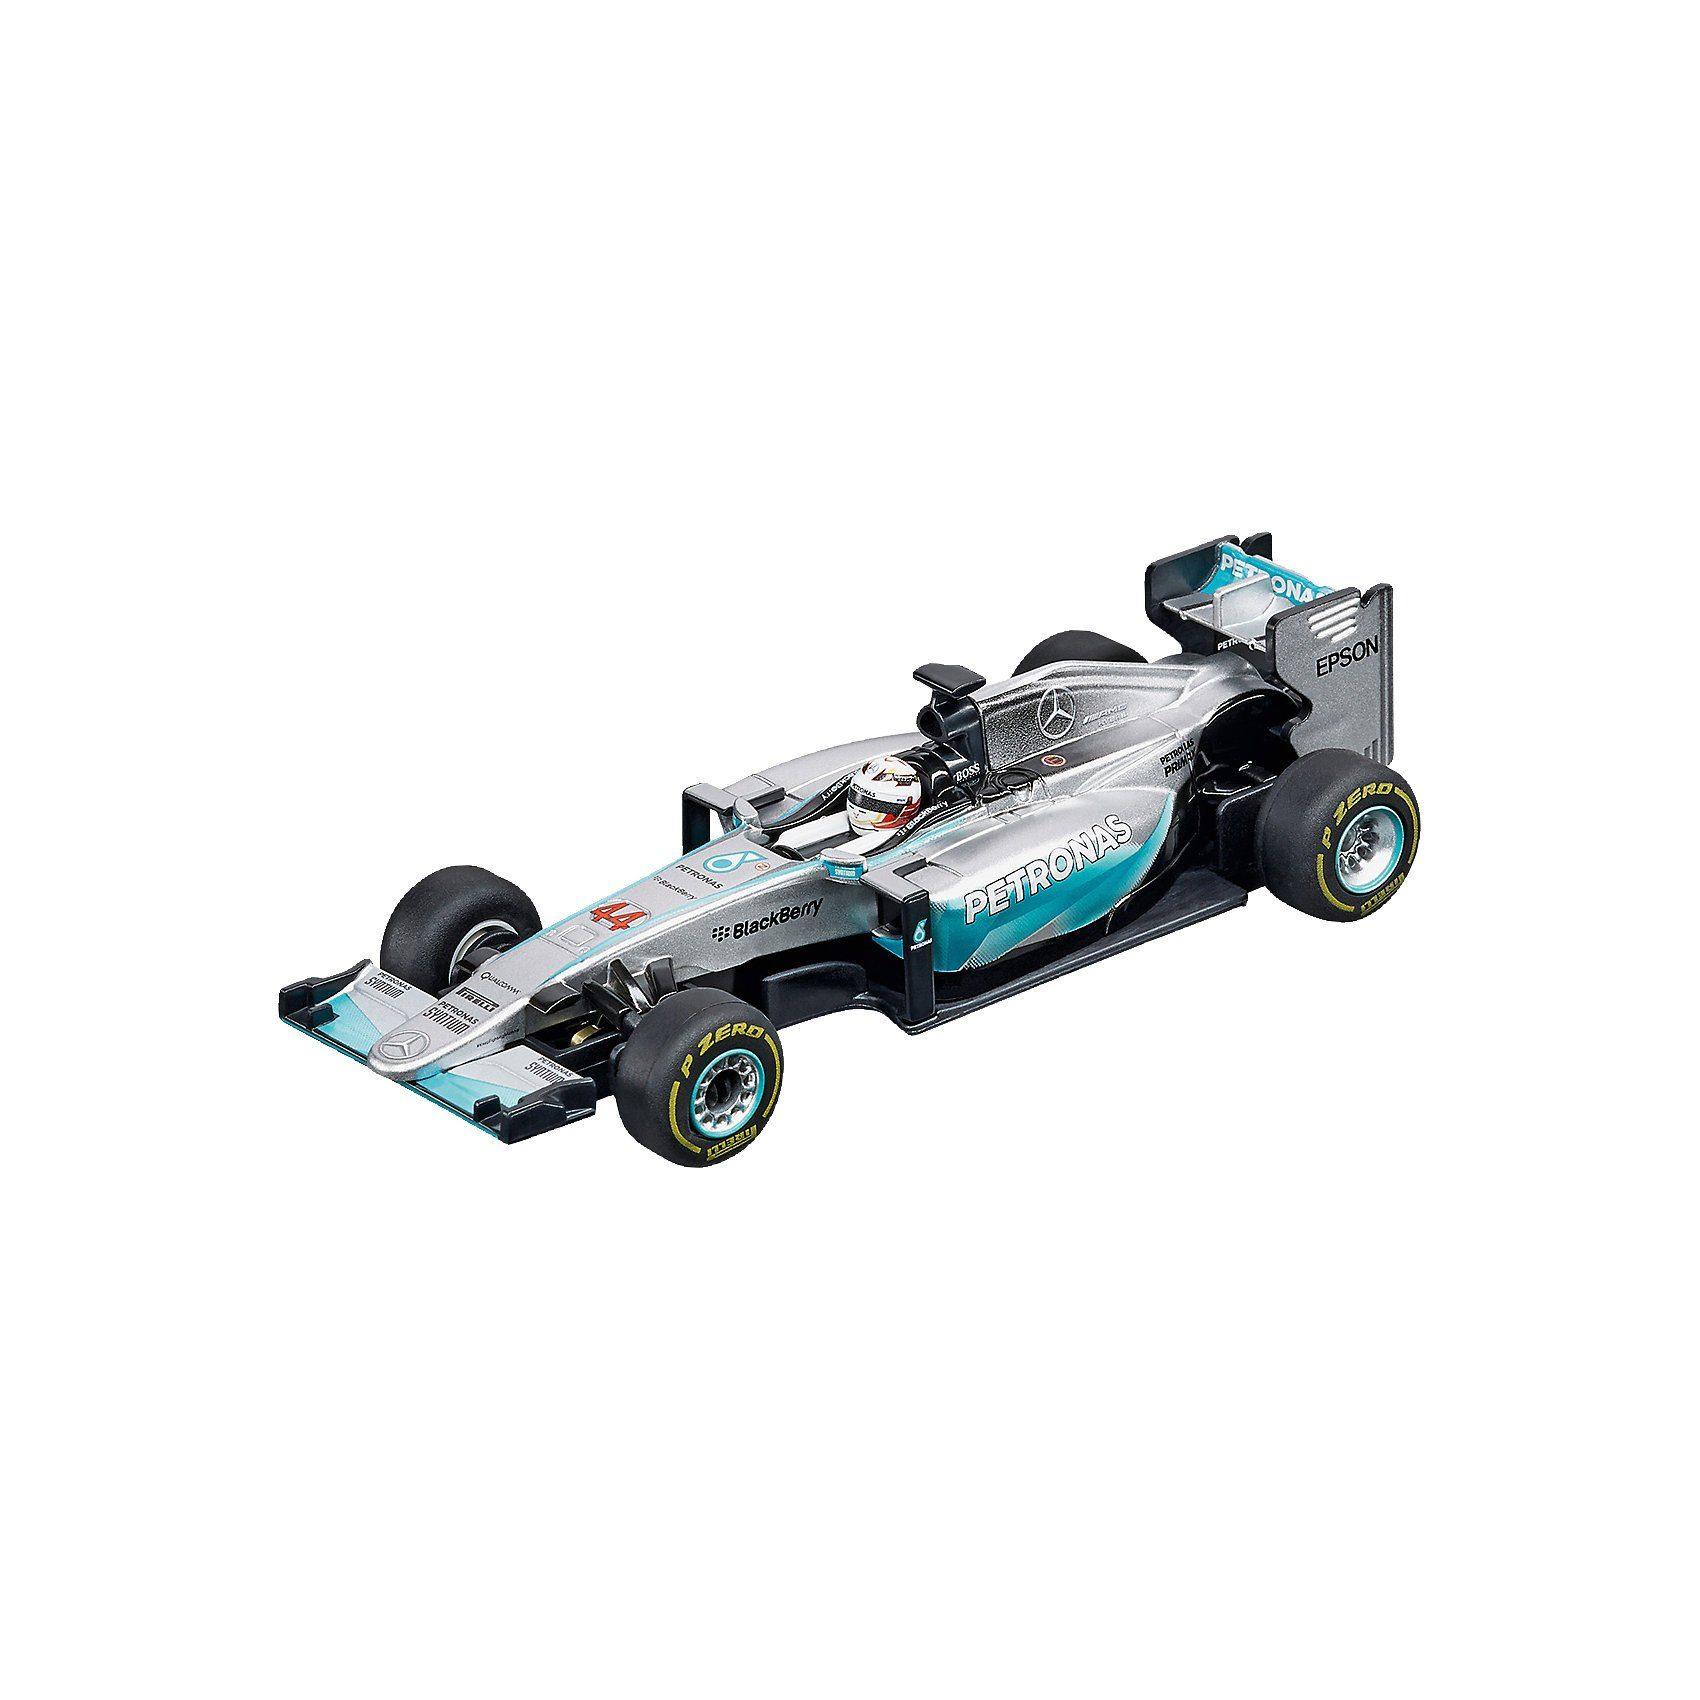 "Carrera GO!!! 64060 Mercedes F1 W06 Hybrid ""L.Hamilton, No.44"""